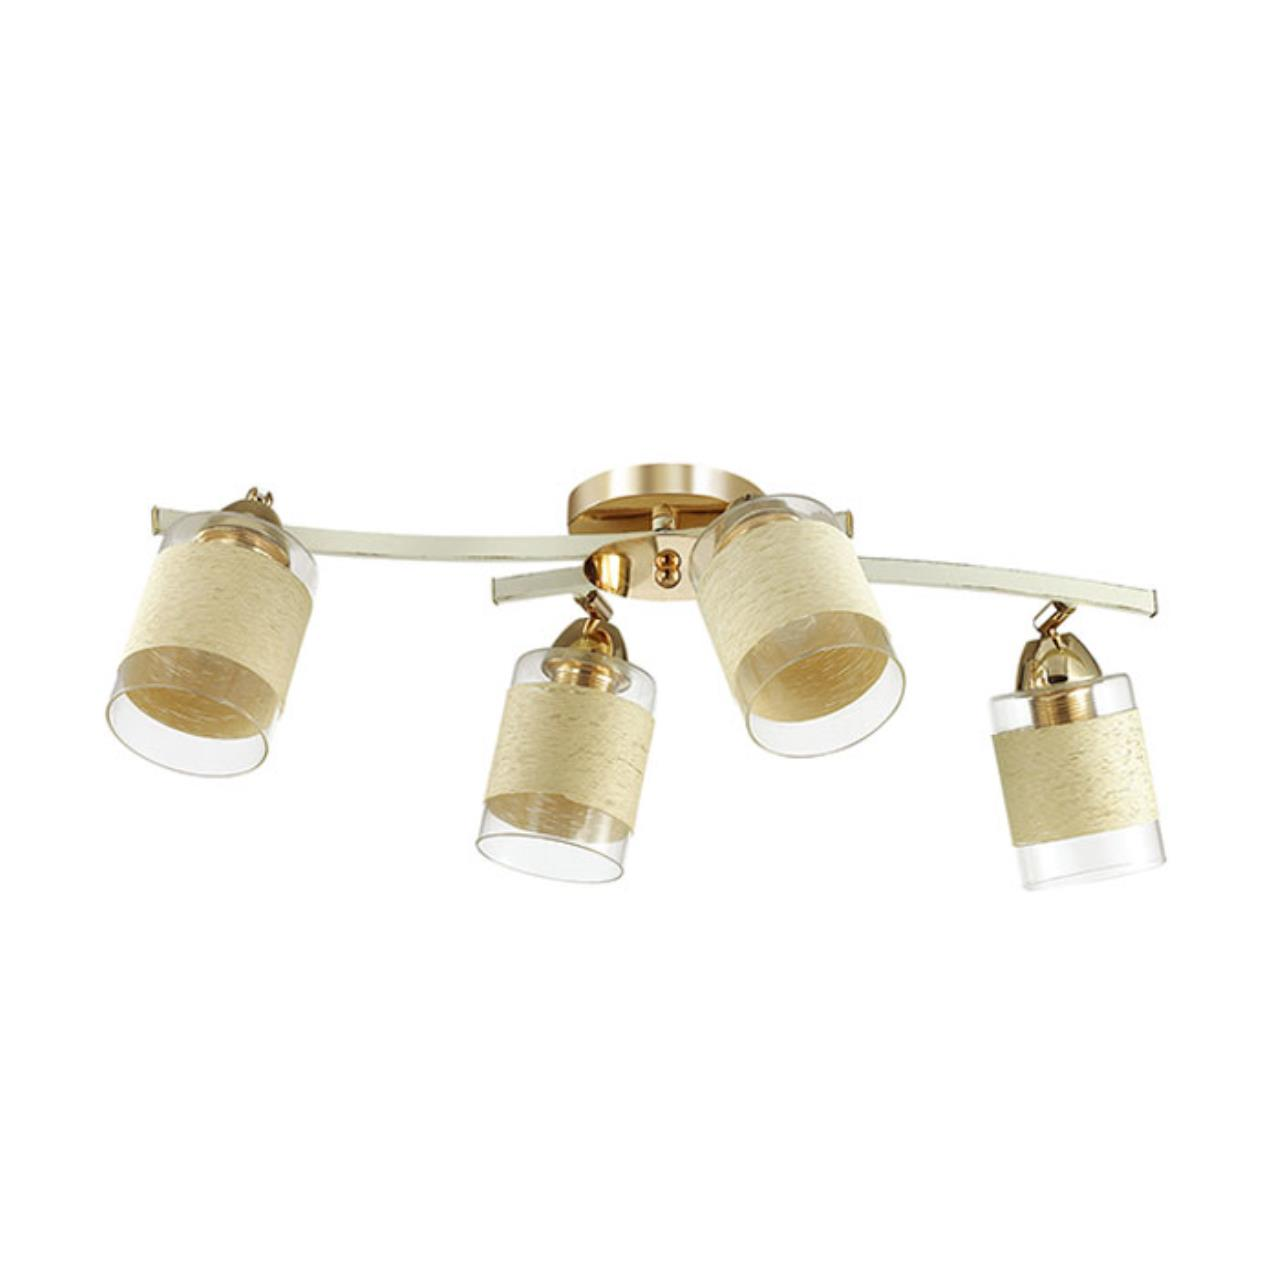 3029/4CA COMFI LN16 168 золото/беж/стекло/декор.тесьма Люстра потолочная E27 4*60W 220V FILLA